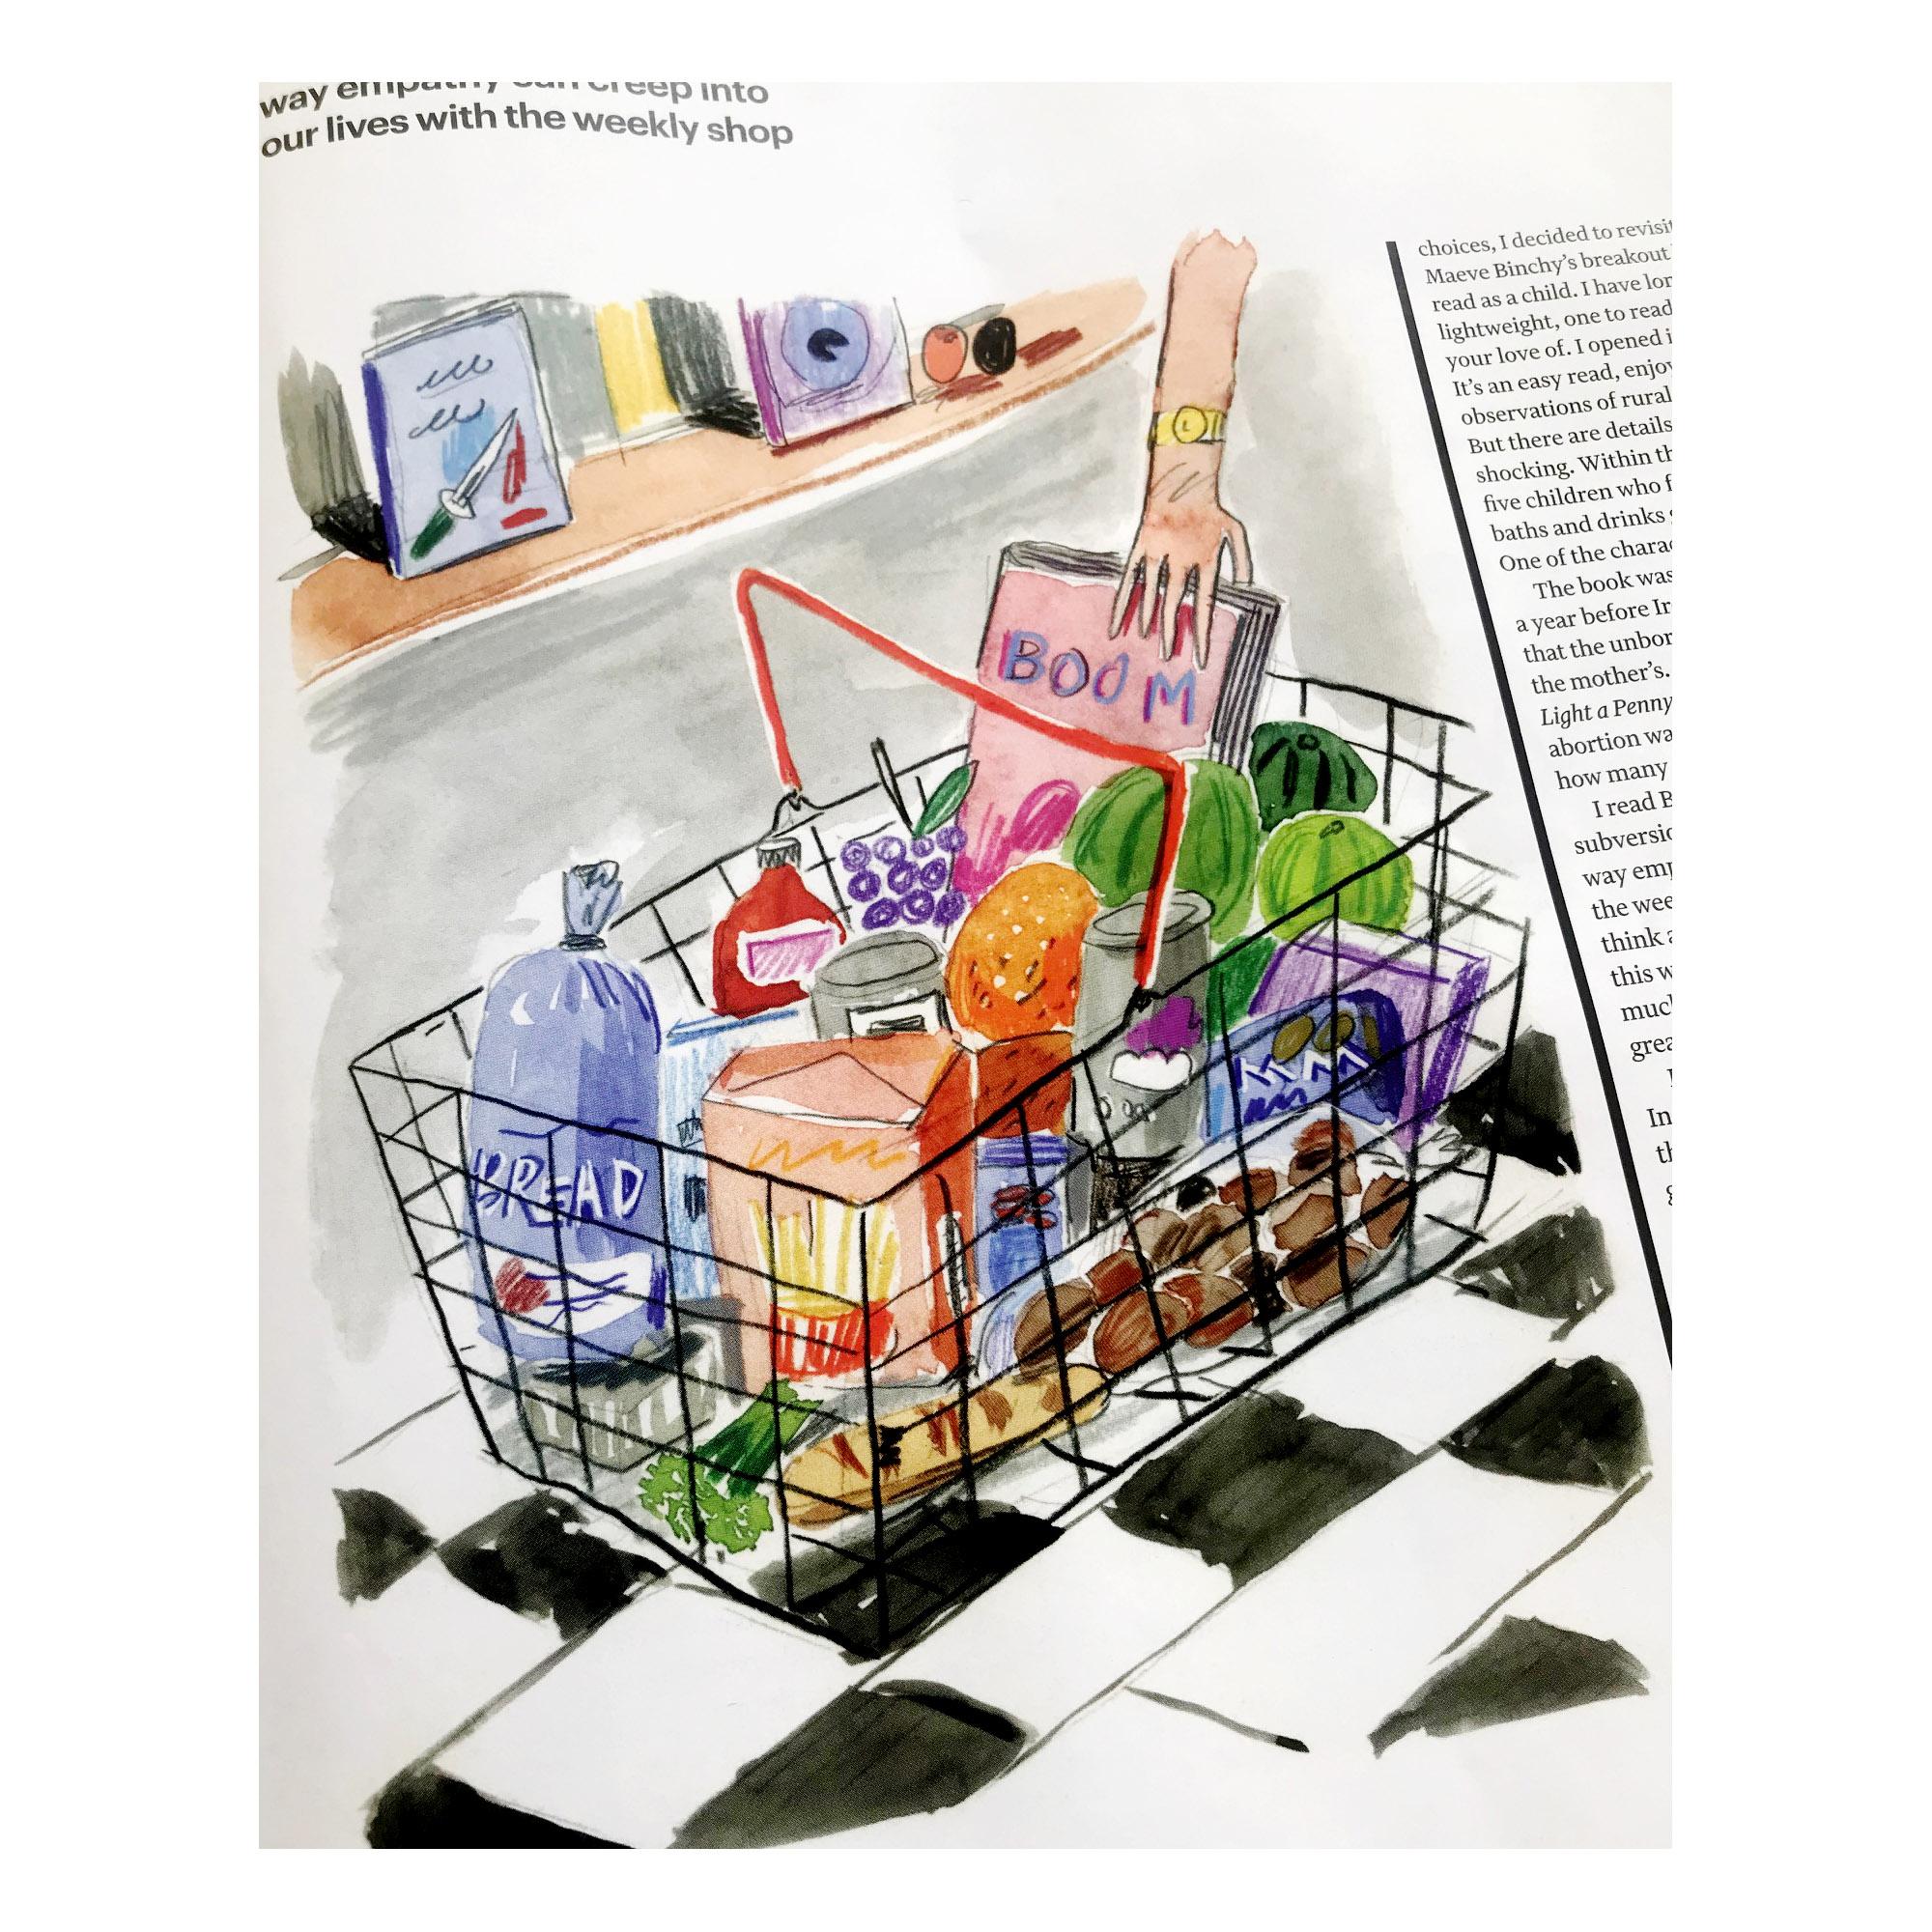 dutchuncle-robert-nicol-FT-weekend-illustrations-8.jpg